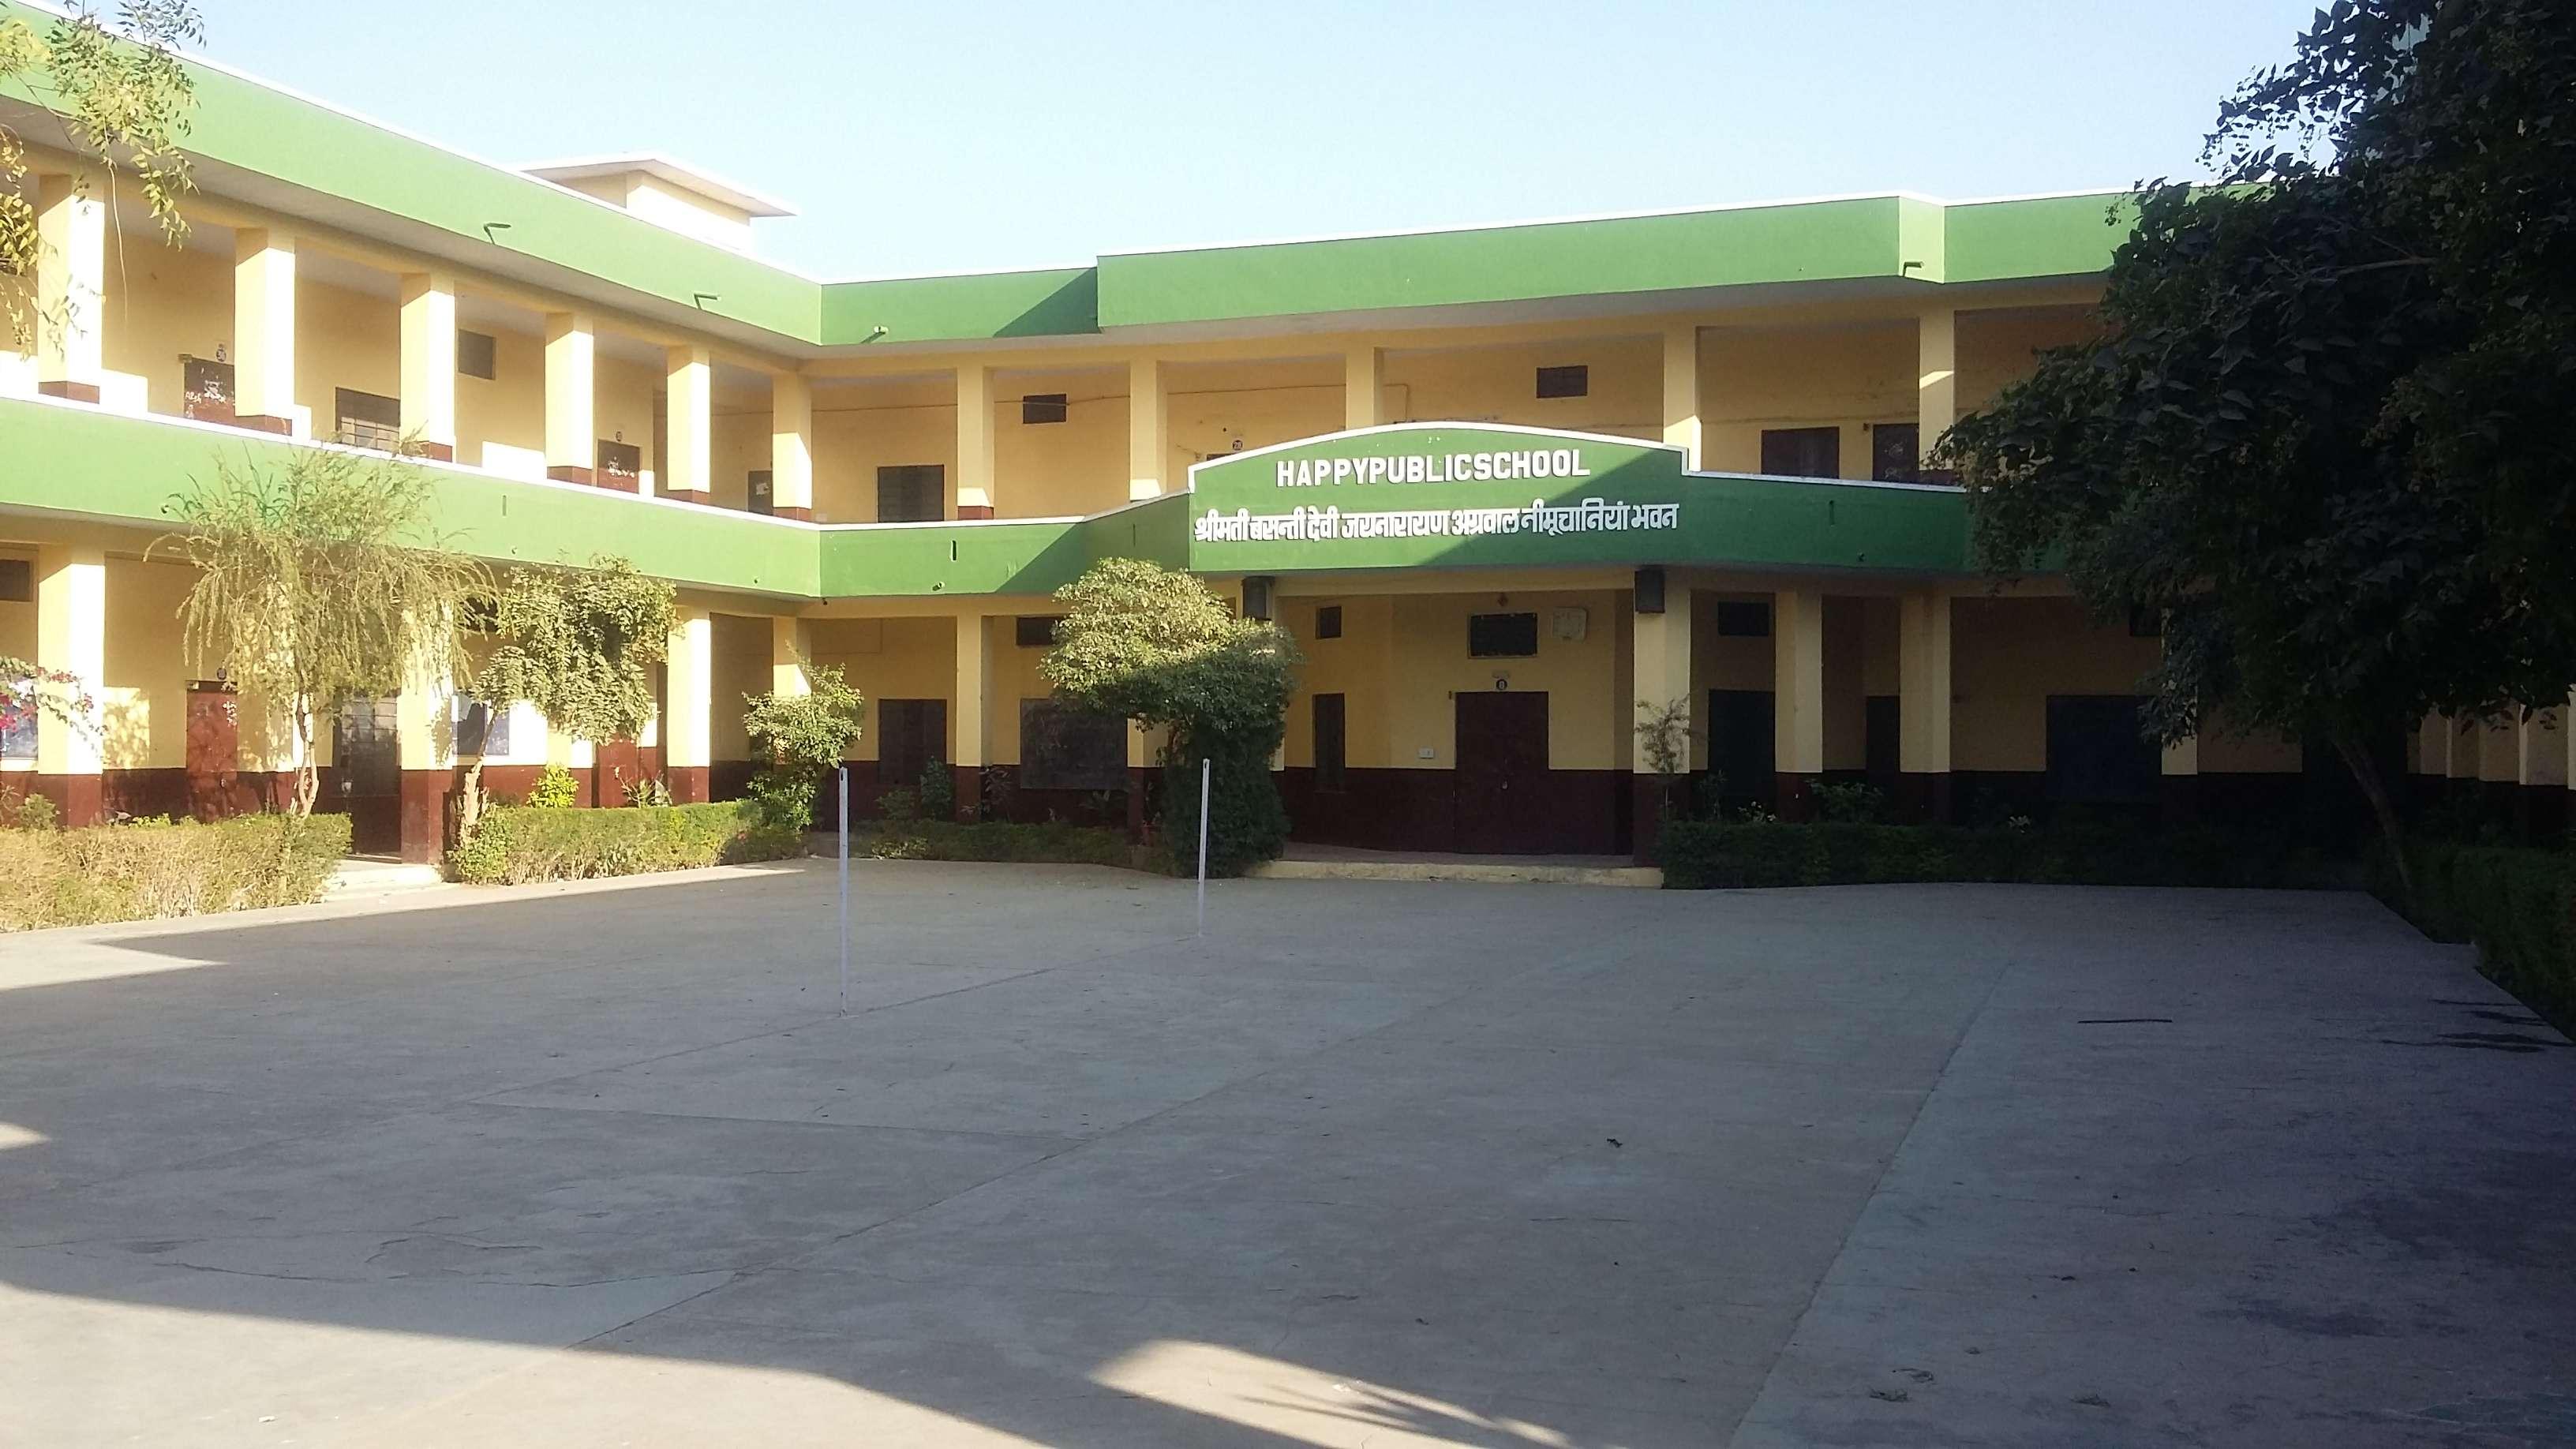 HAPPY PUBLIC SCHOOL SWAMI DAYANAND MARG ALWAR RAJASTHAN - The